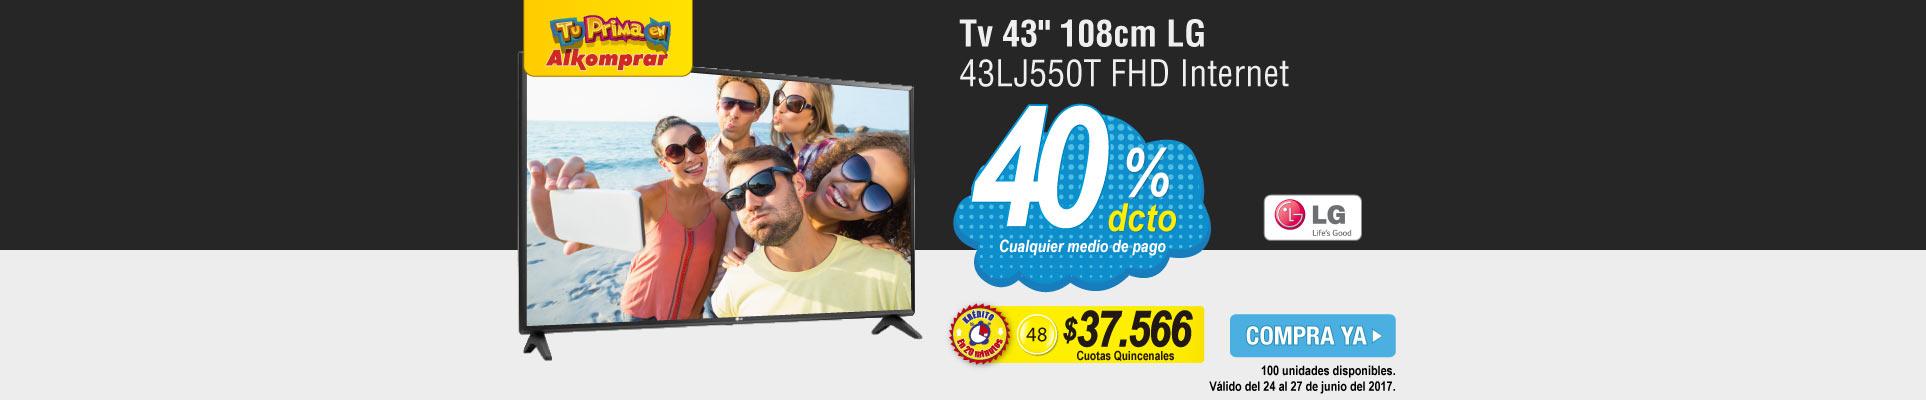 Tv 43 108cm LG 43LJ550T FHD Internet - banner principal